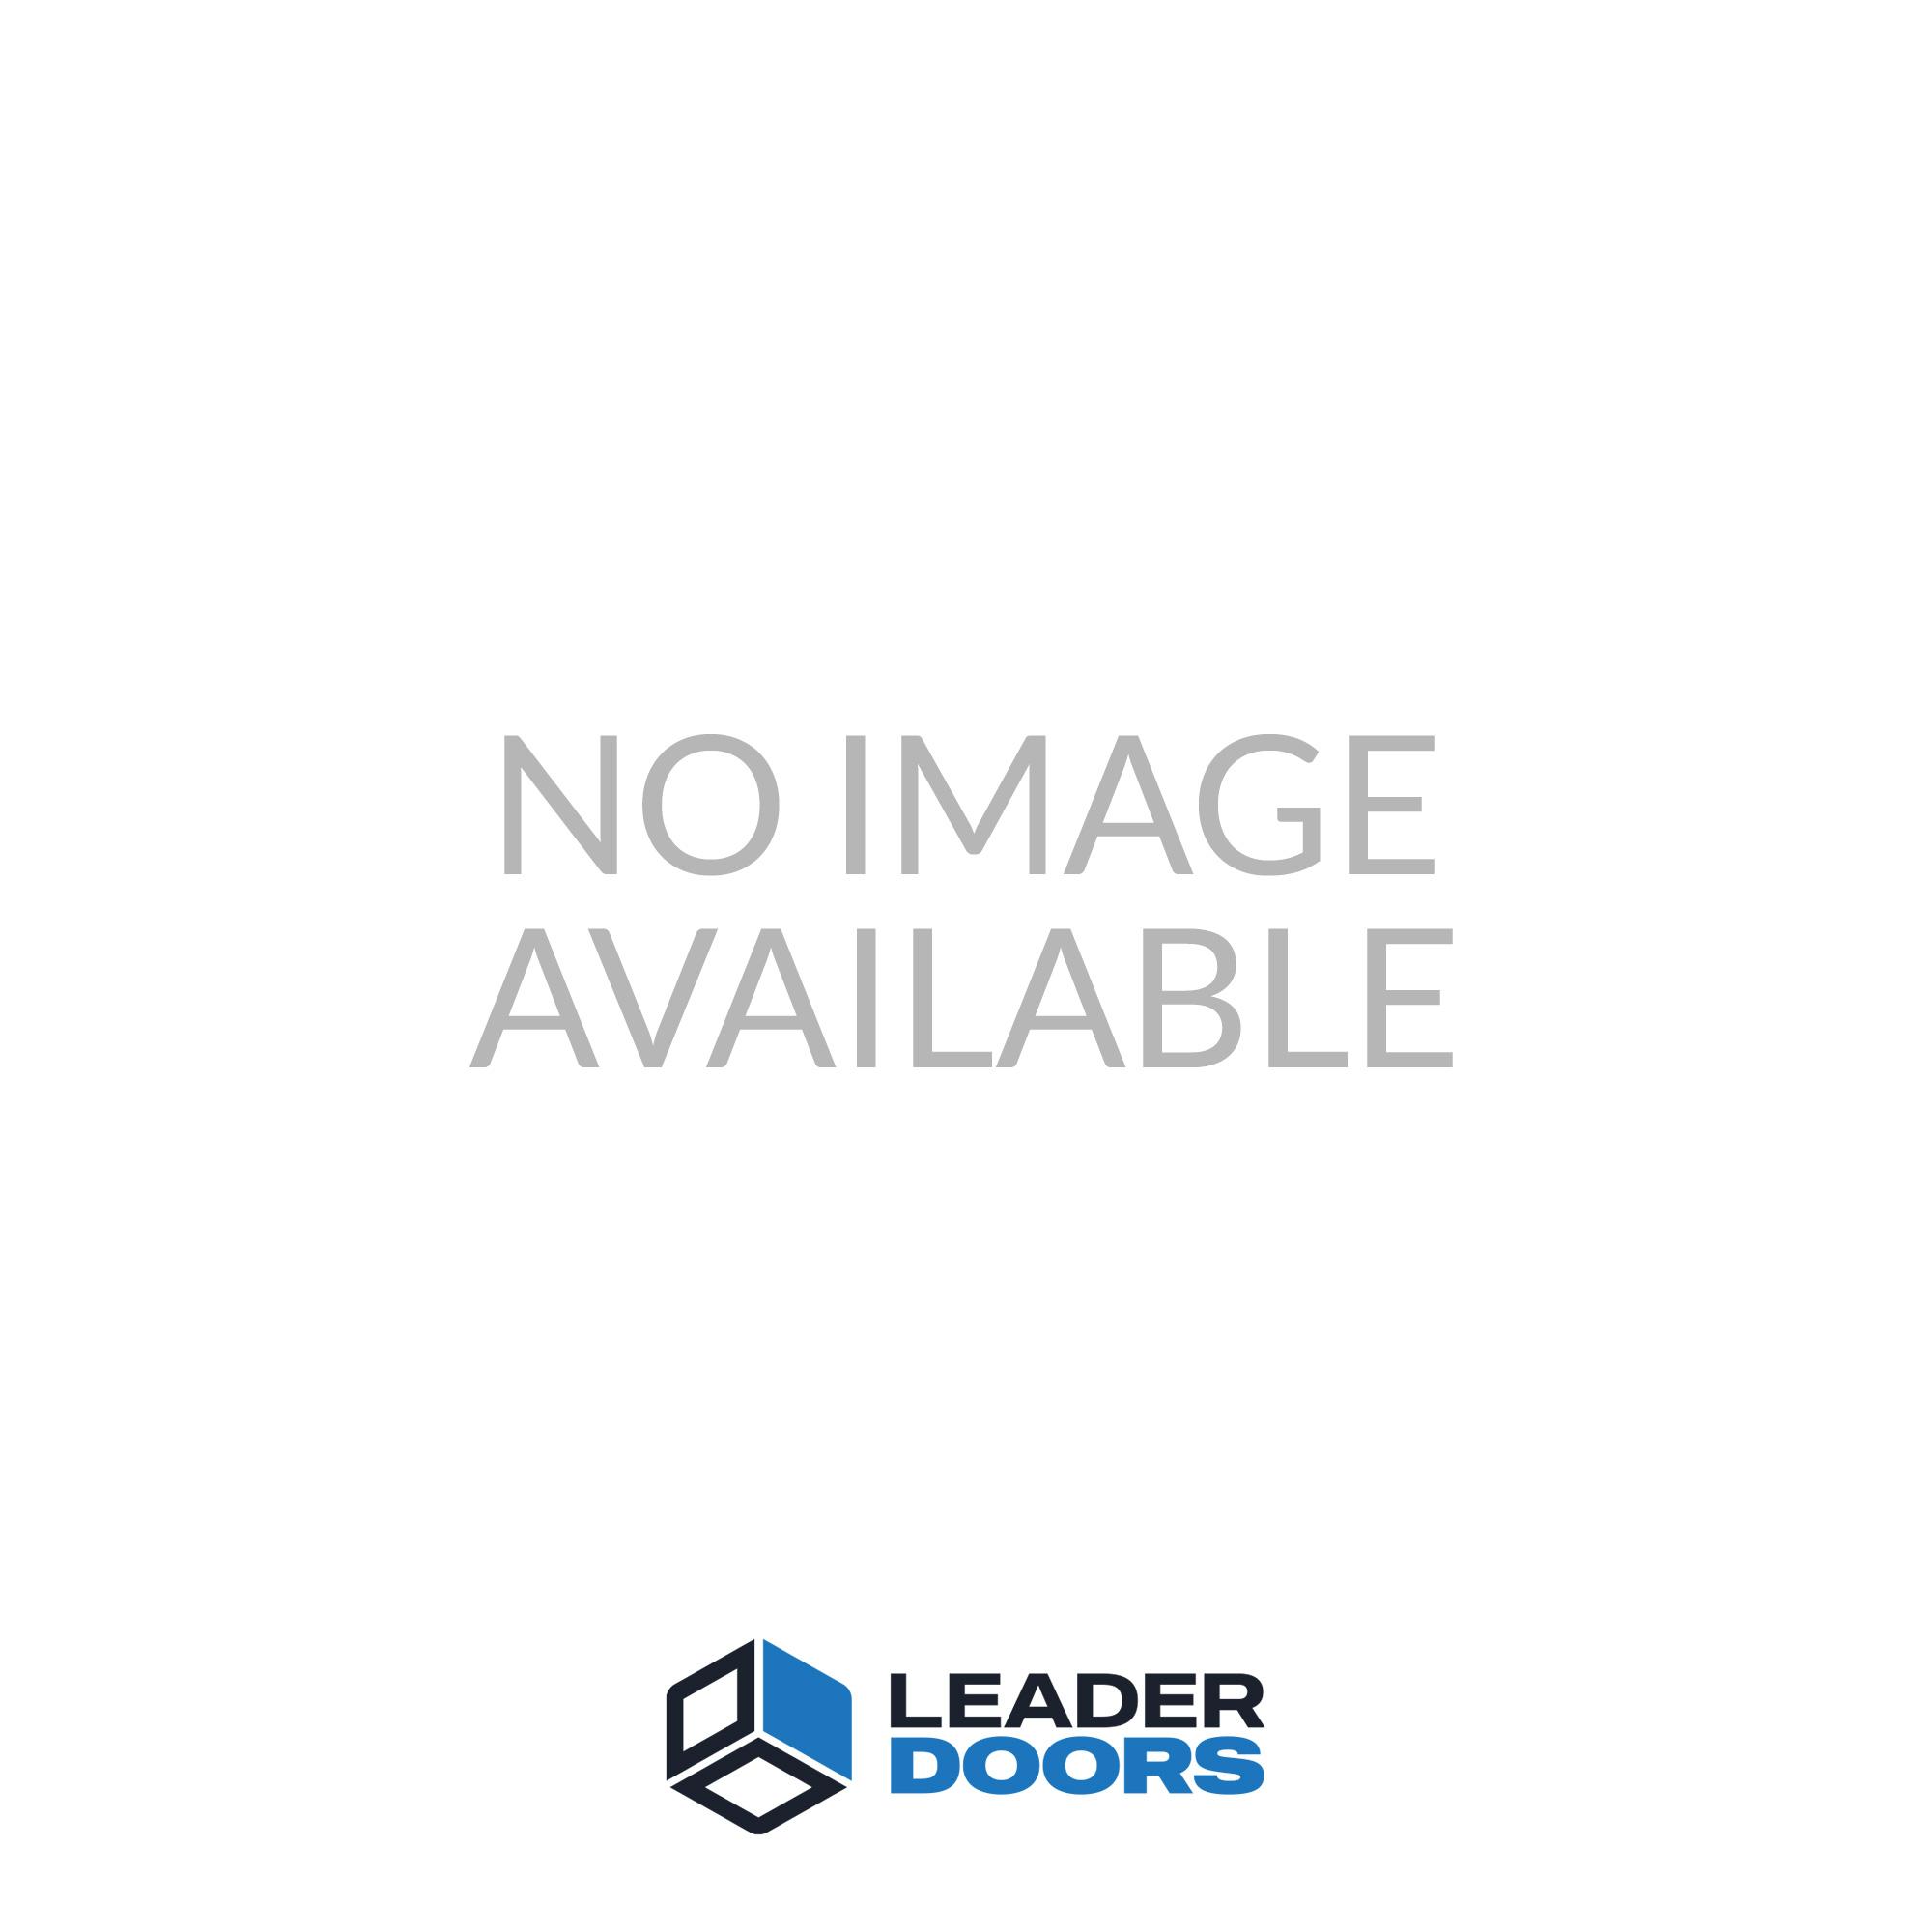 External Chartwell Composite Speedwell Door with White Frame  sc 1 st  Leader Doors & LPD Doors UK | LPD Doors | Leader Doors